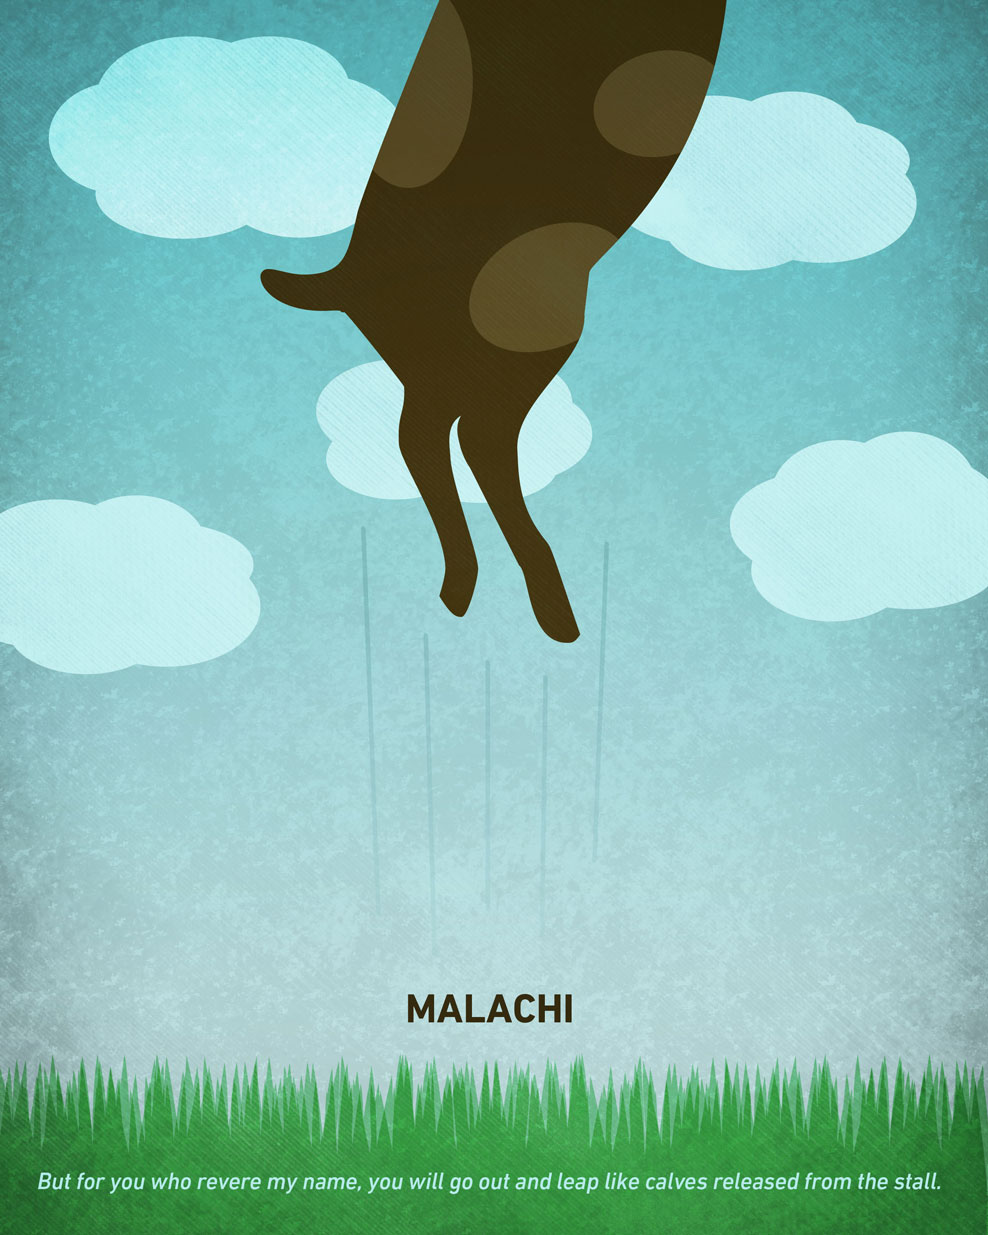 39-Malachi_Jim-LePage.jpg